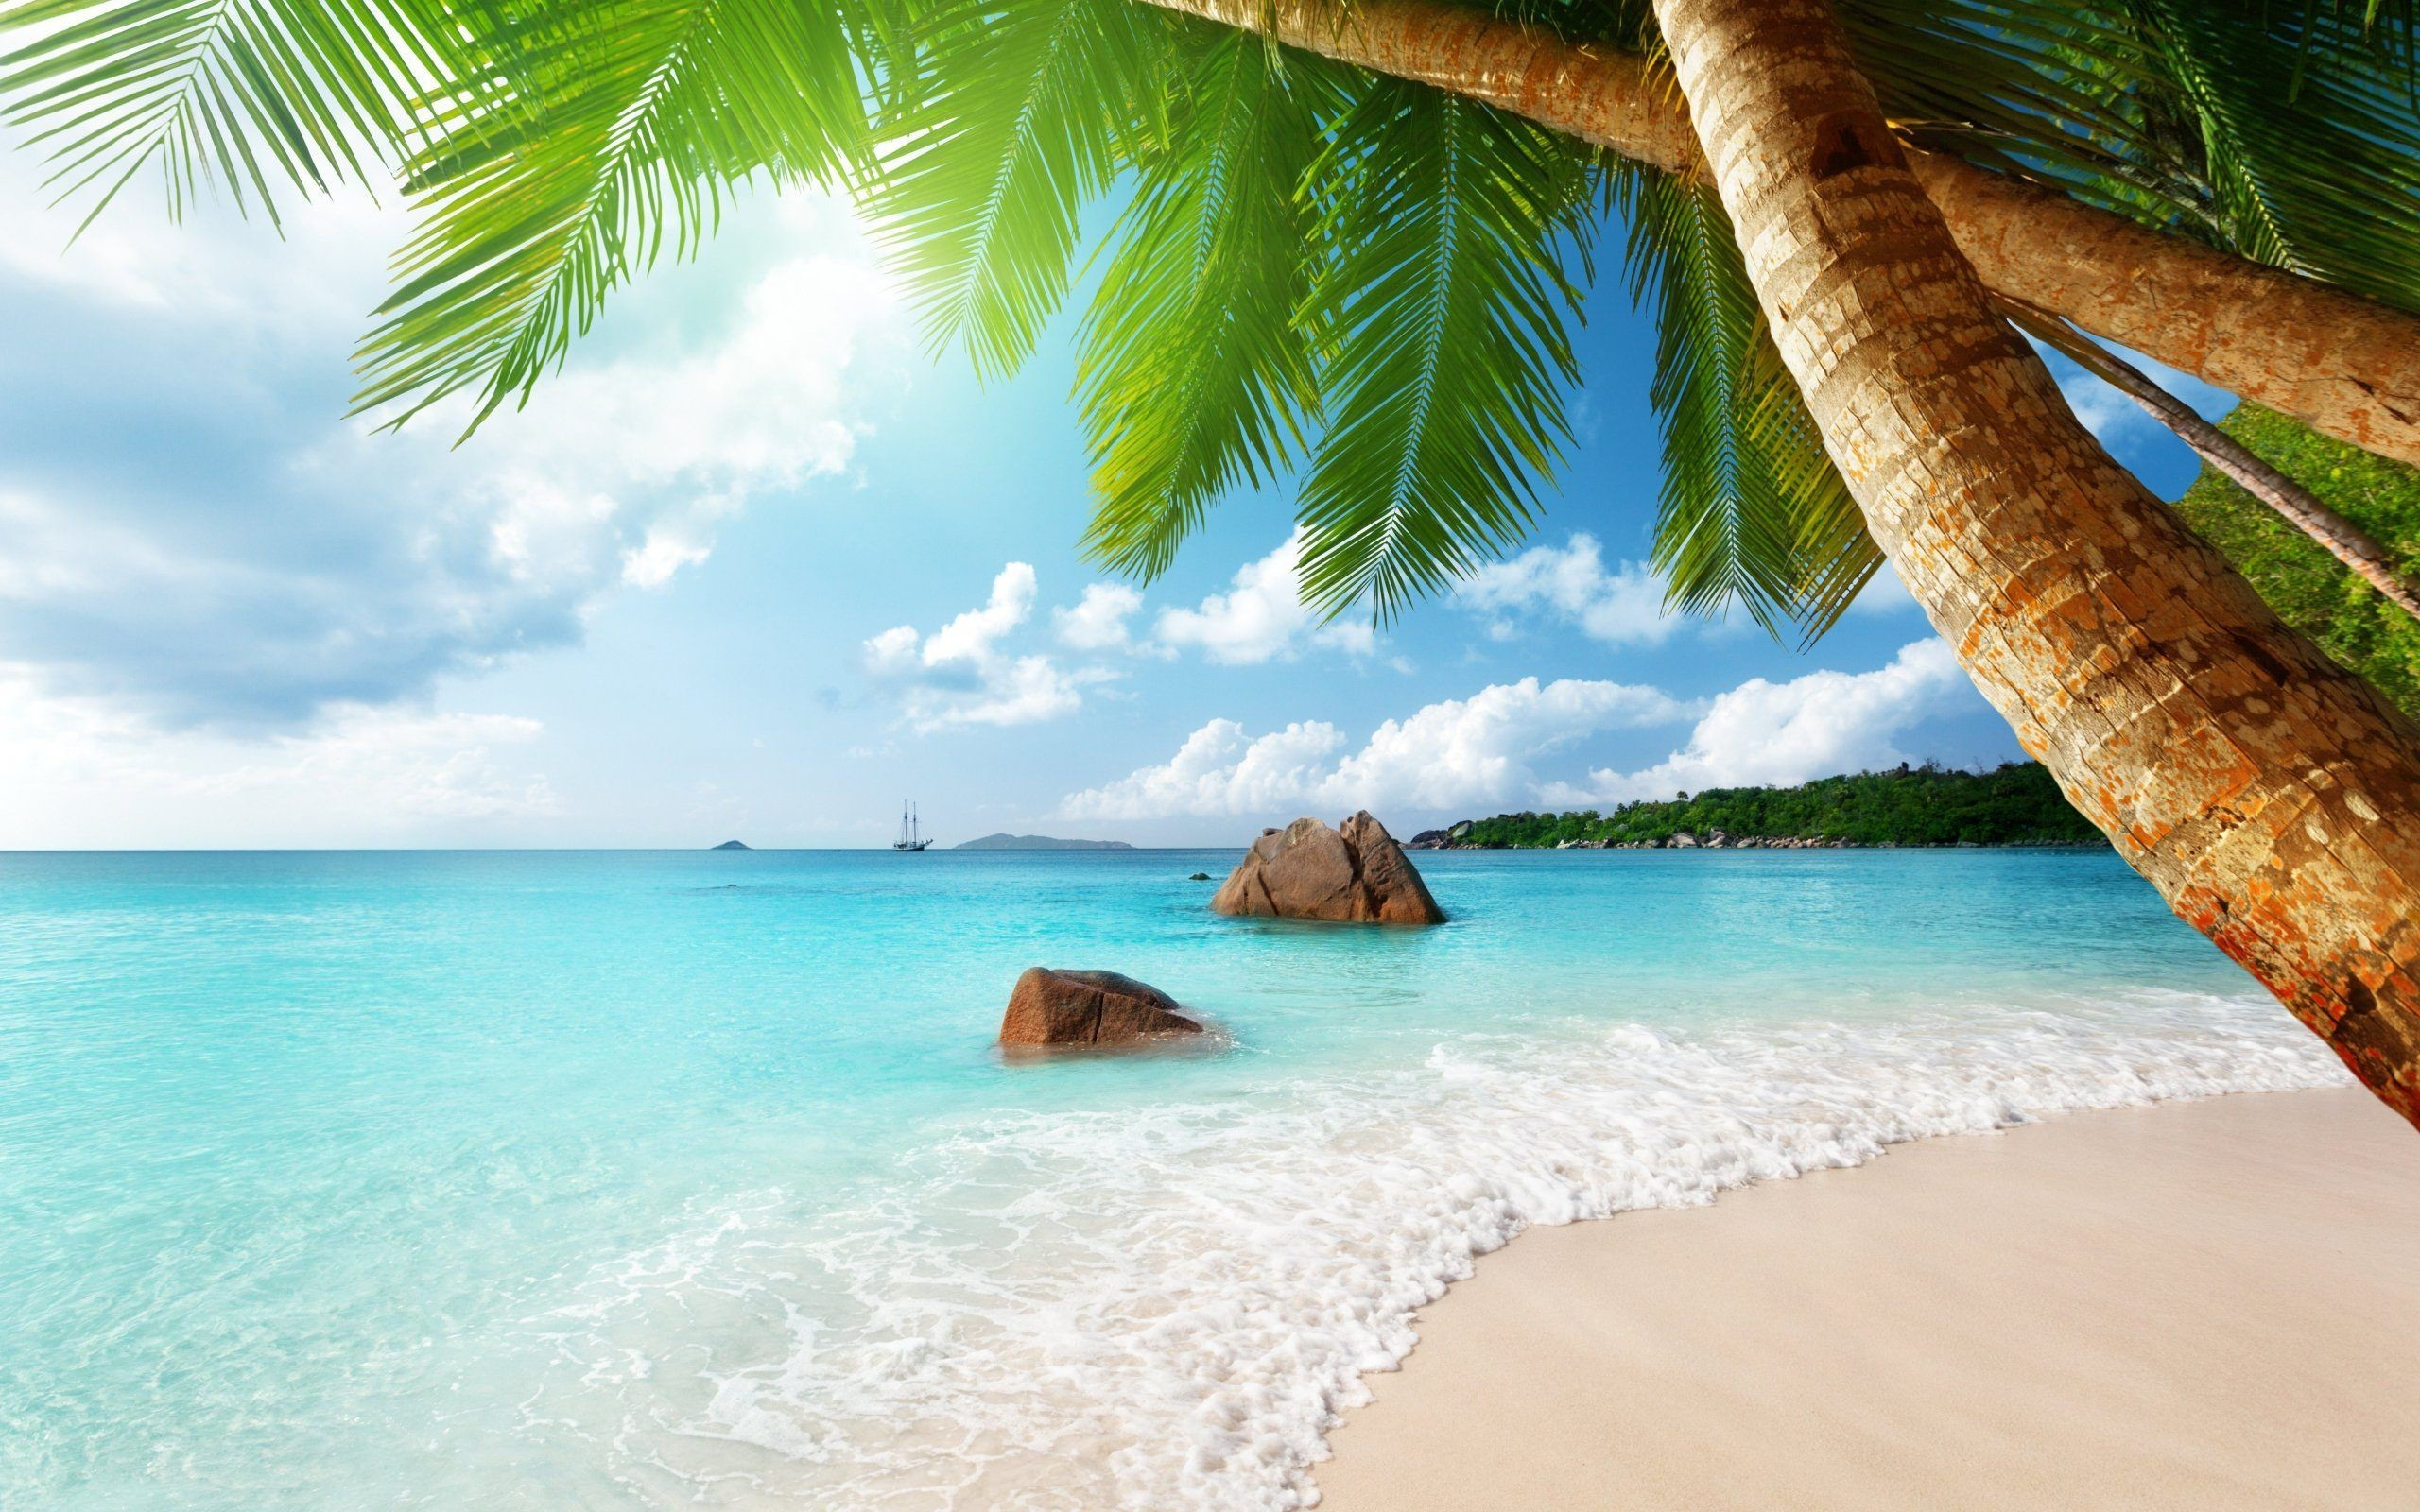 Res: 2560x1600, Beautiful Ocean Beach Landscape Wallpaper HD Download